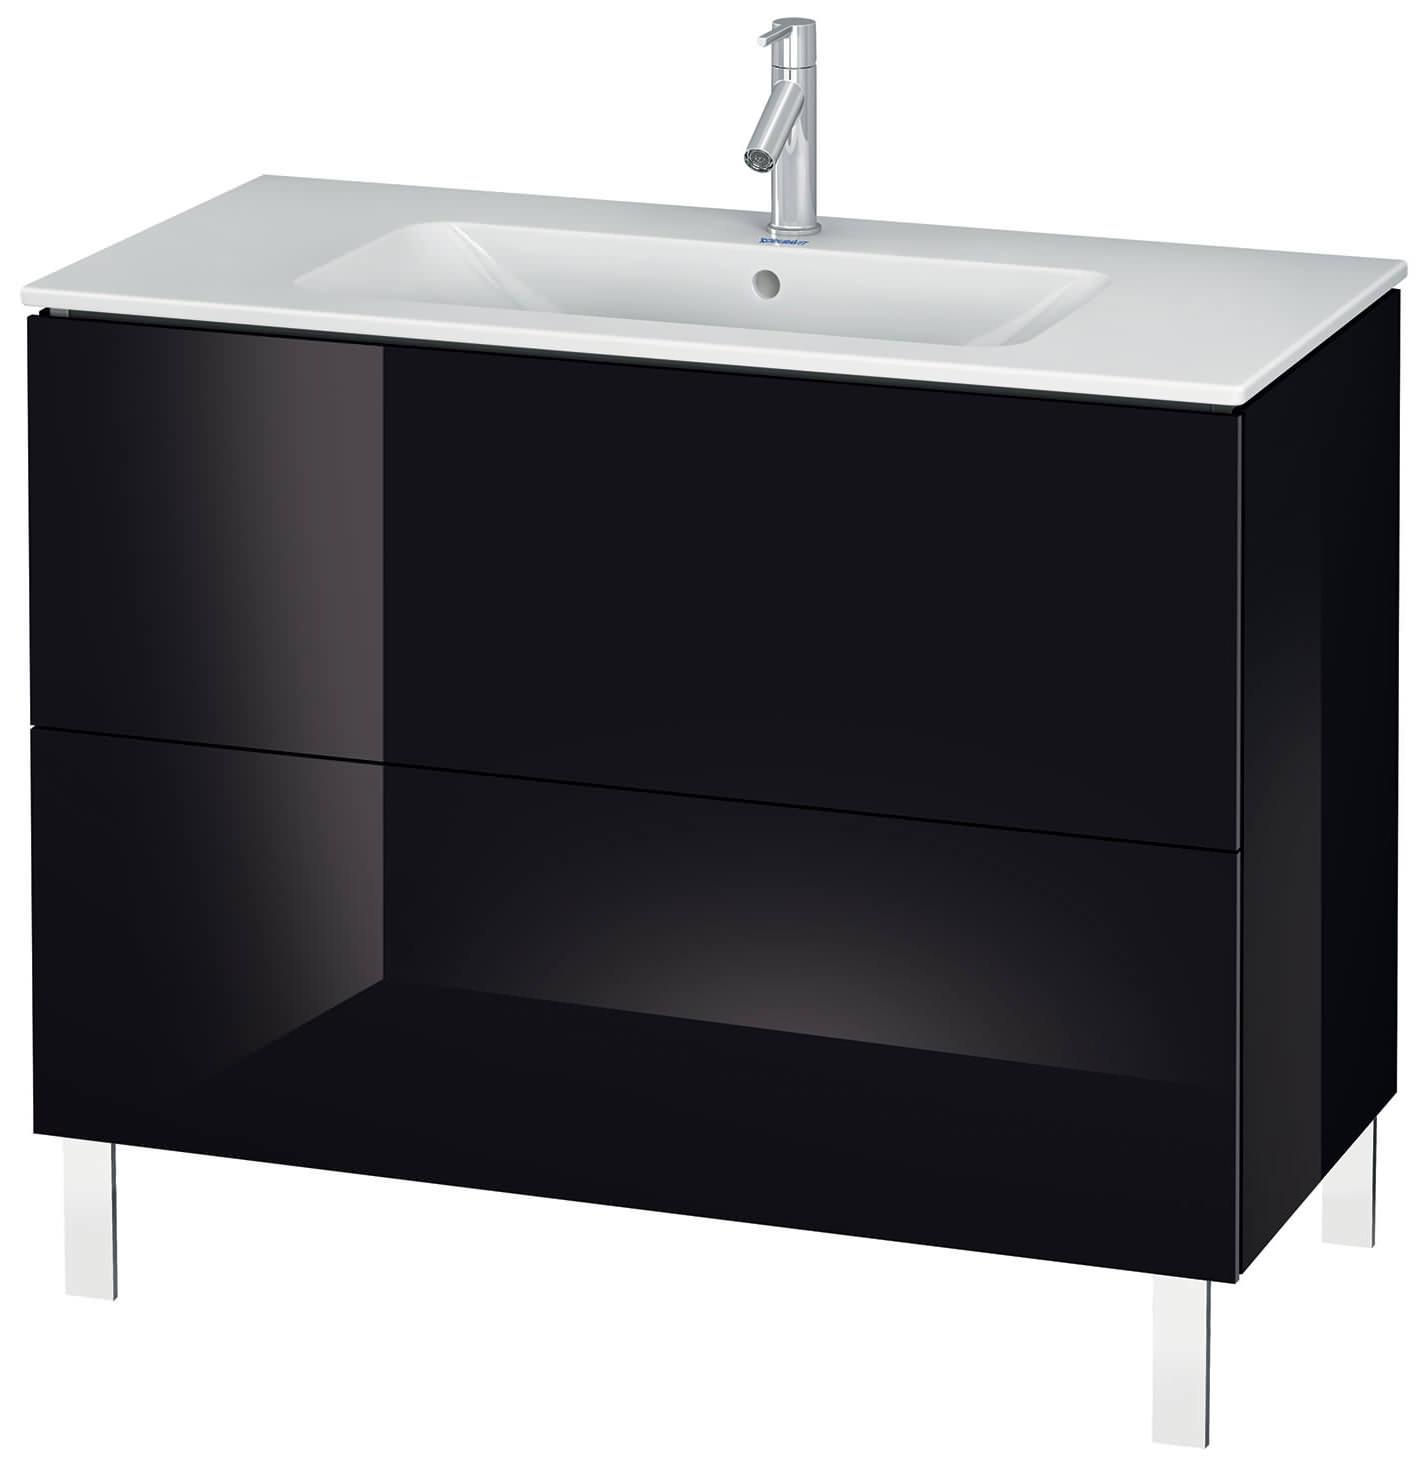 duravit l cube 1020mm floor standing vanity unit with me by starck basin. Black Bedroom Furniture Sets. Home Design Ideas